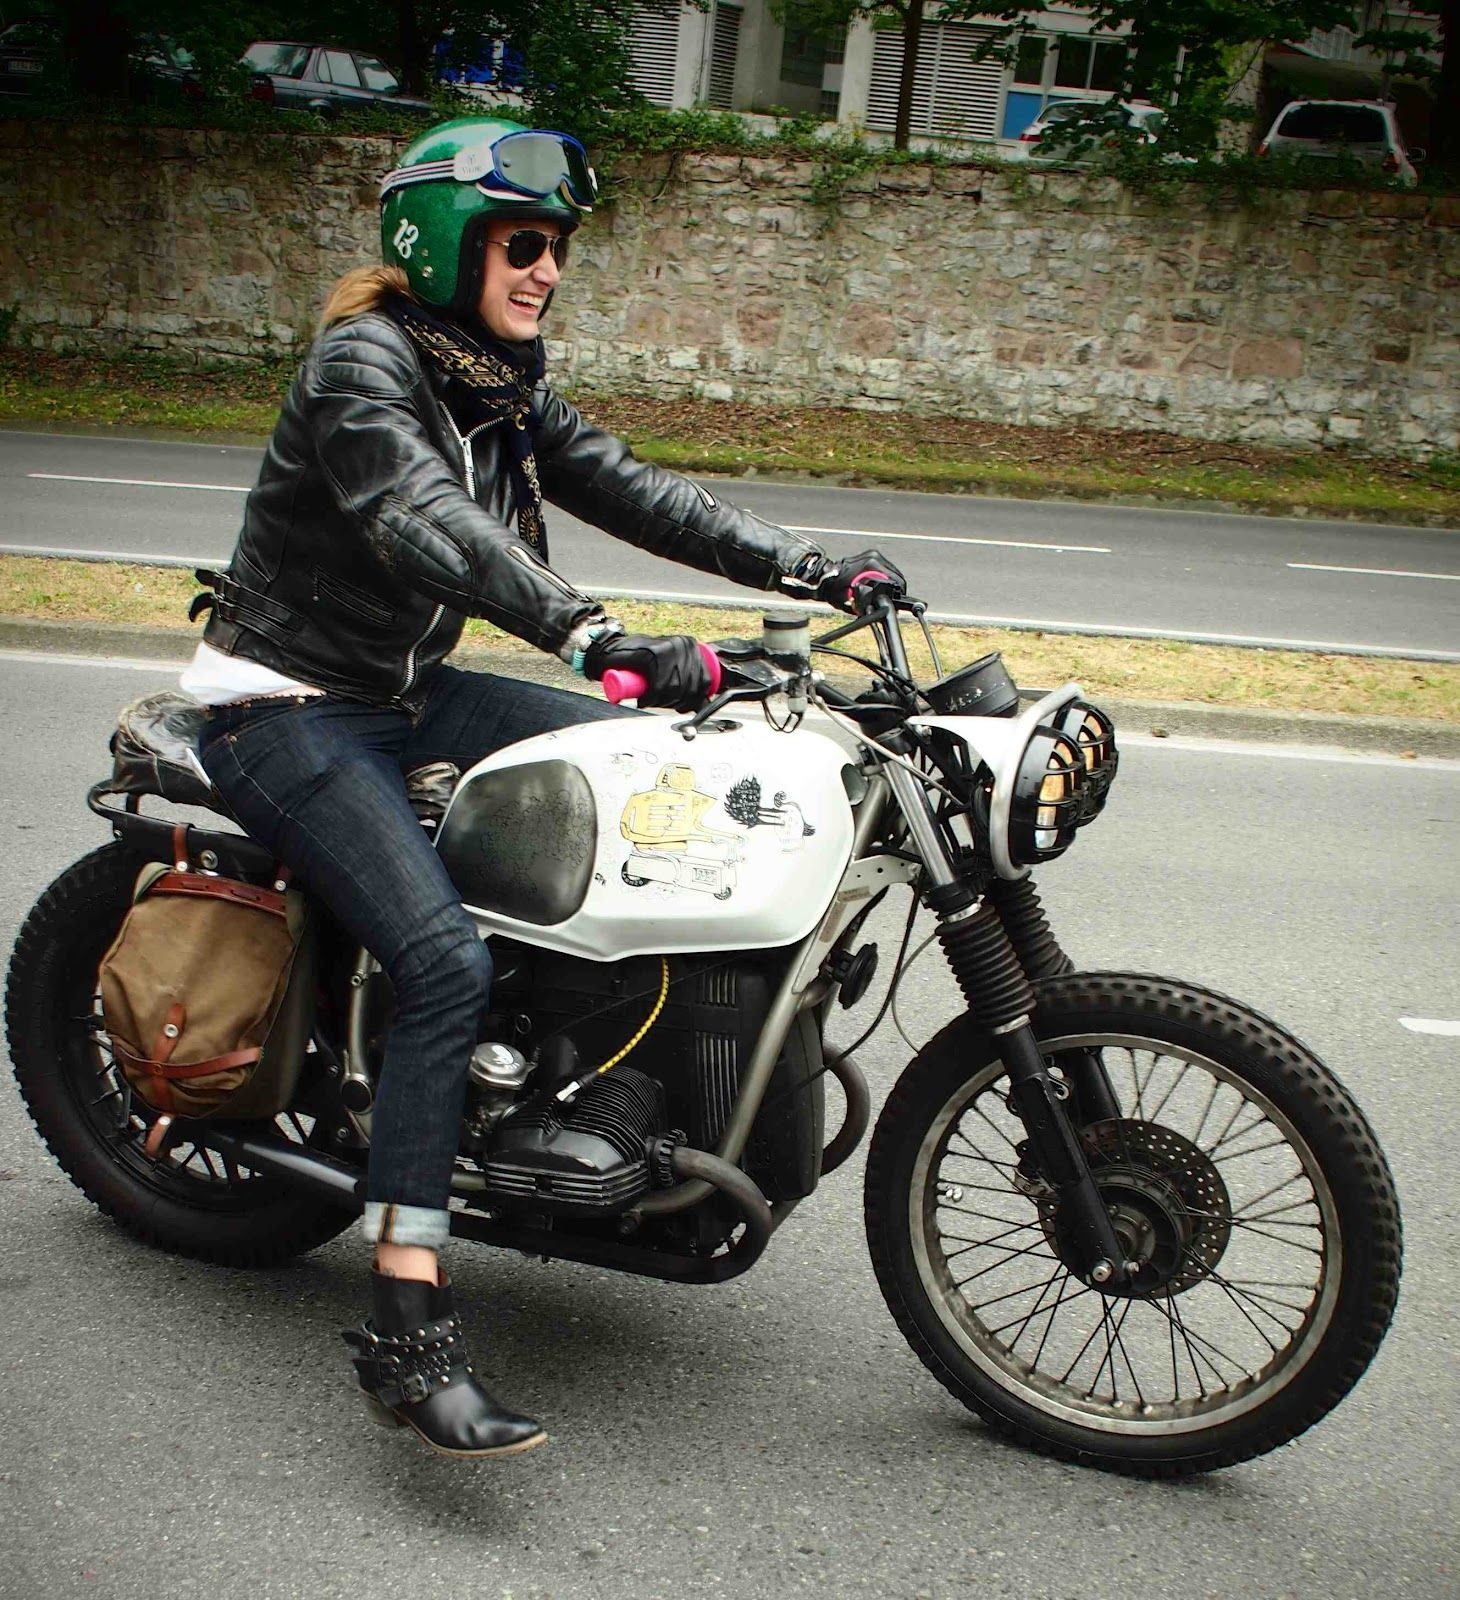 pin von p sauter auf motorcycles motorcycle old. Black Bedroom Furniture Sets. Home Design Ideas